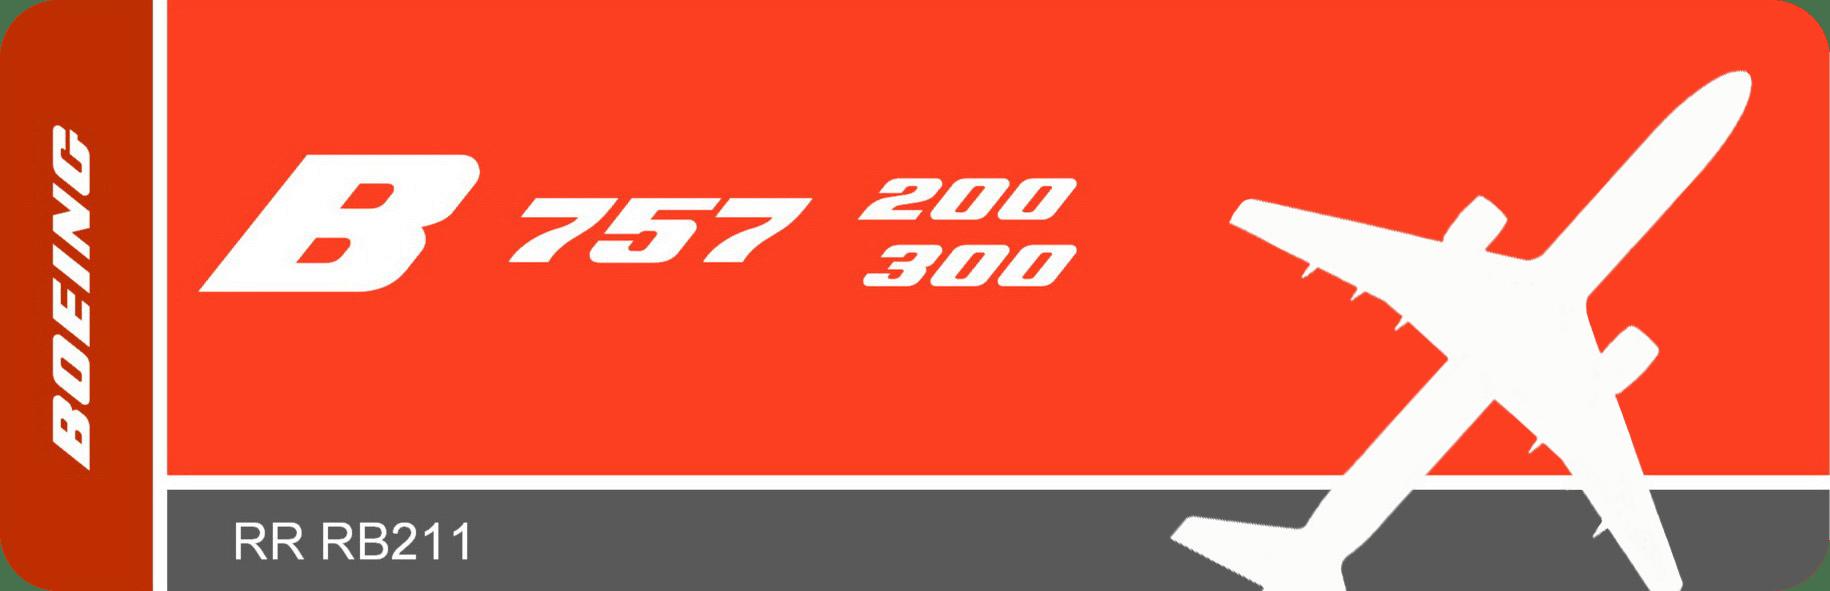 B757 200/300